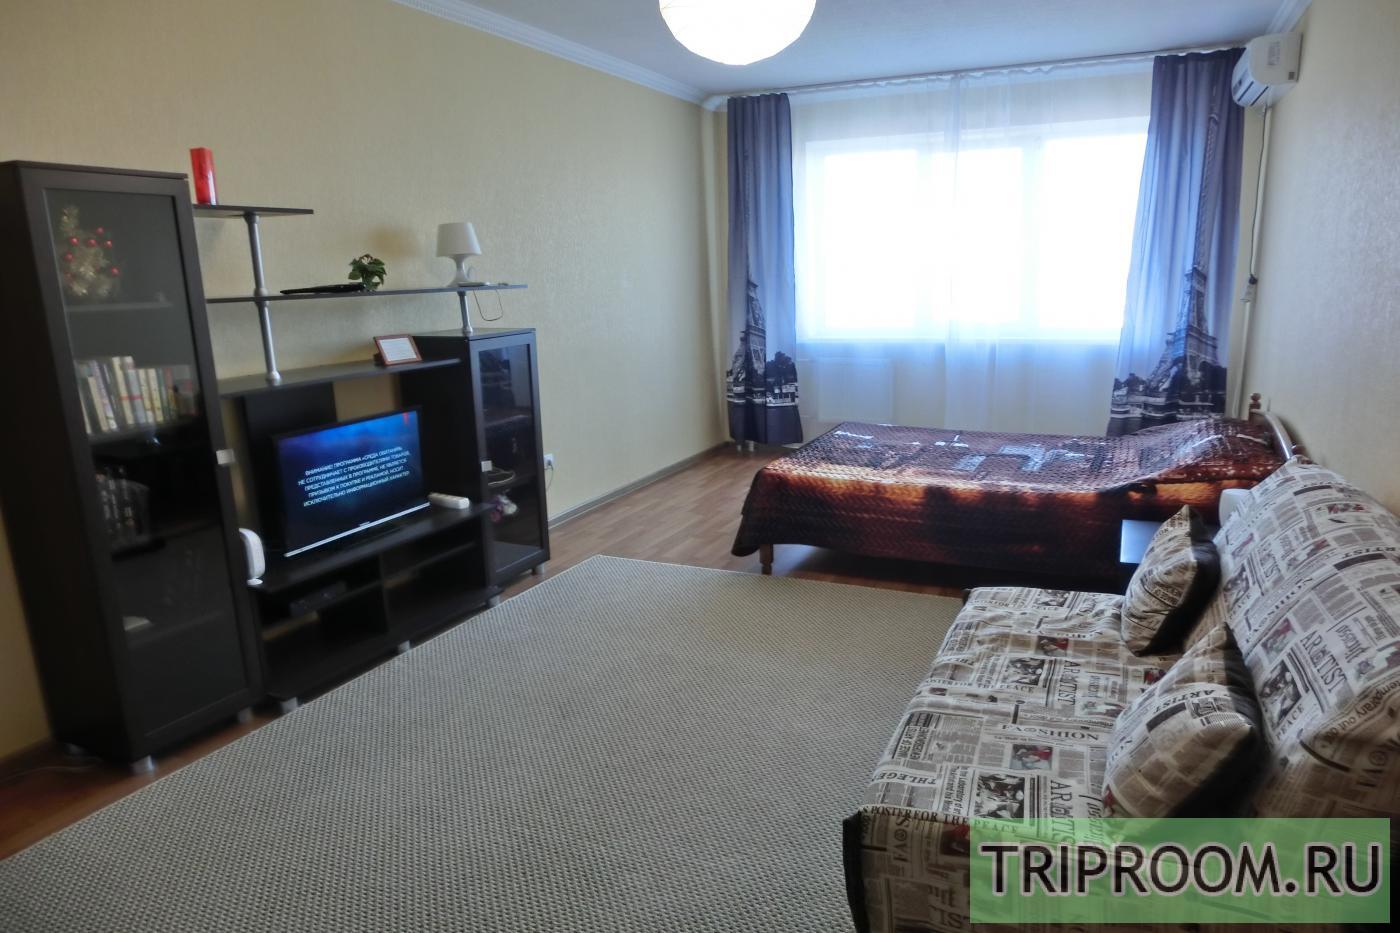 1-комнатная квартира посуточно (вариант № 10598), ул. Фабричная улица, фото № 2